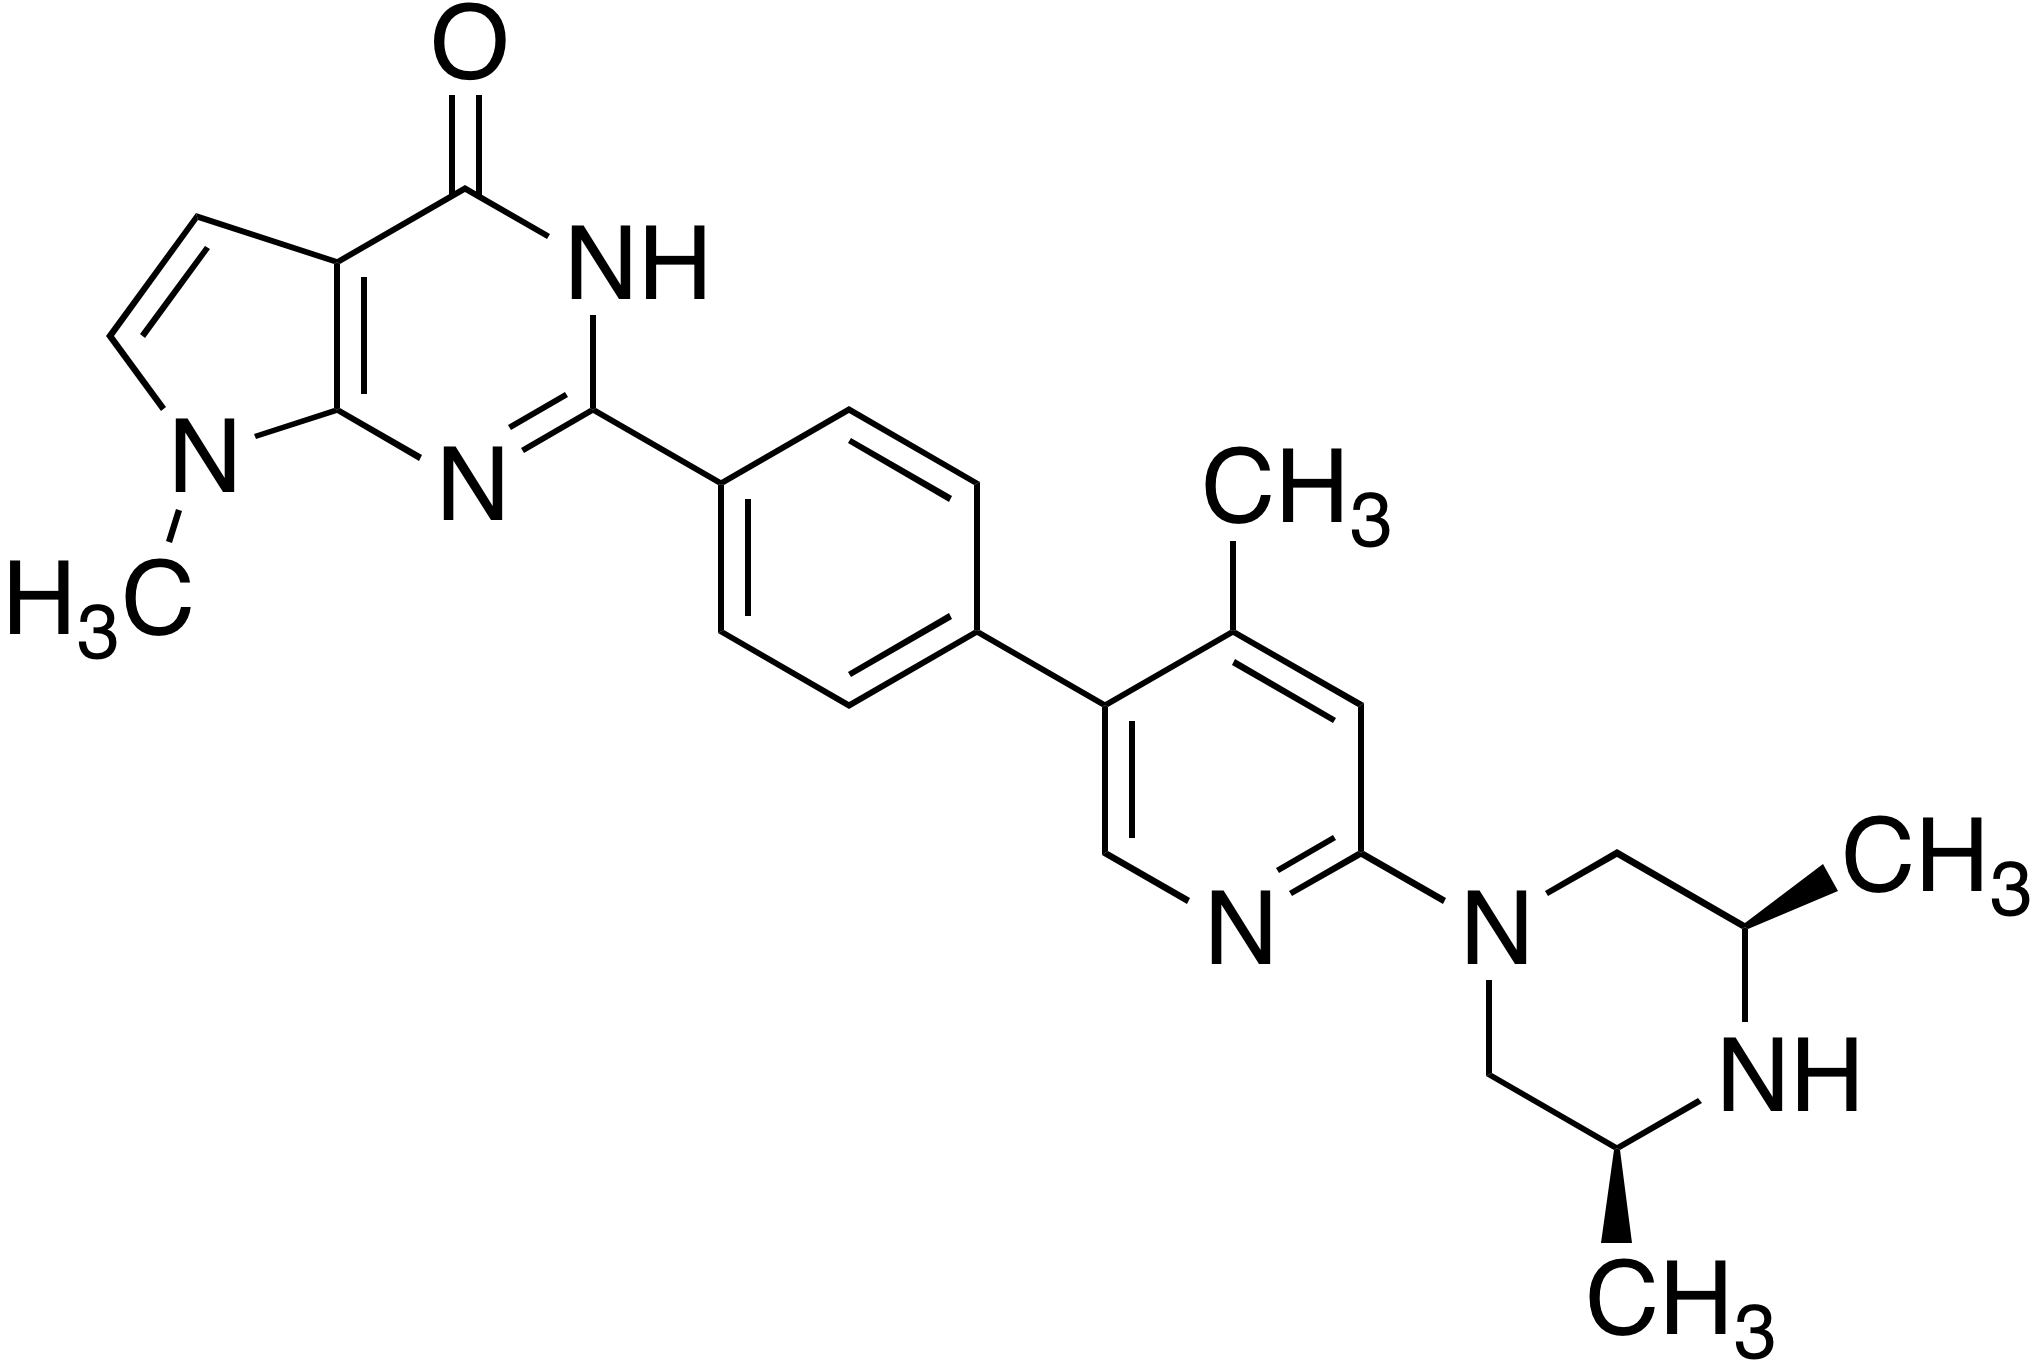 AZ6102